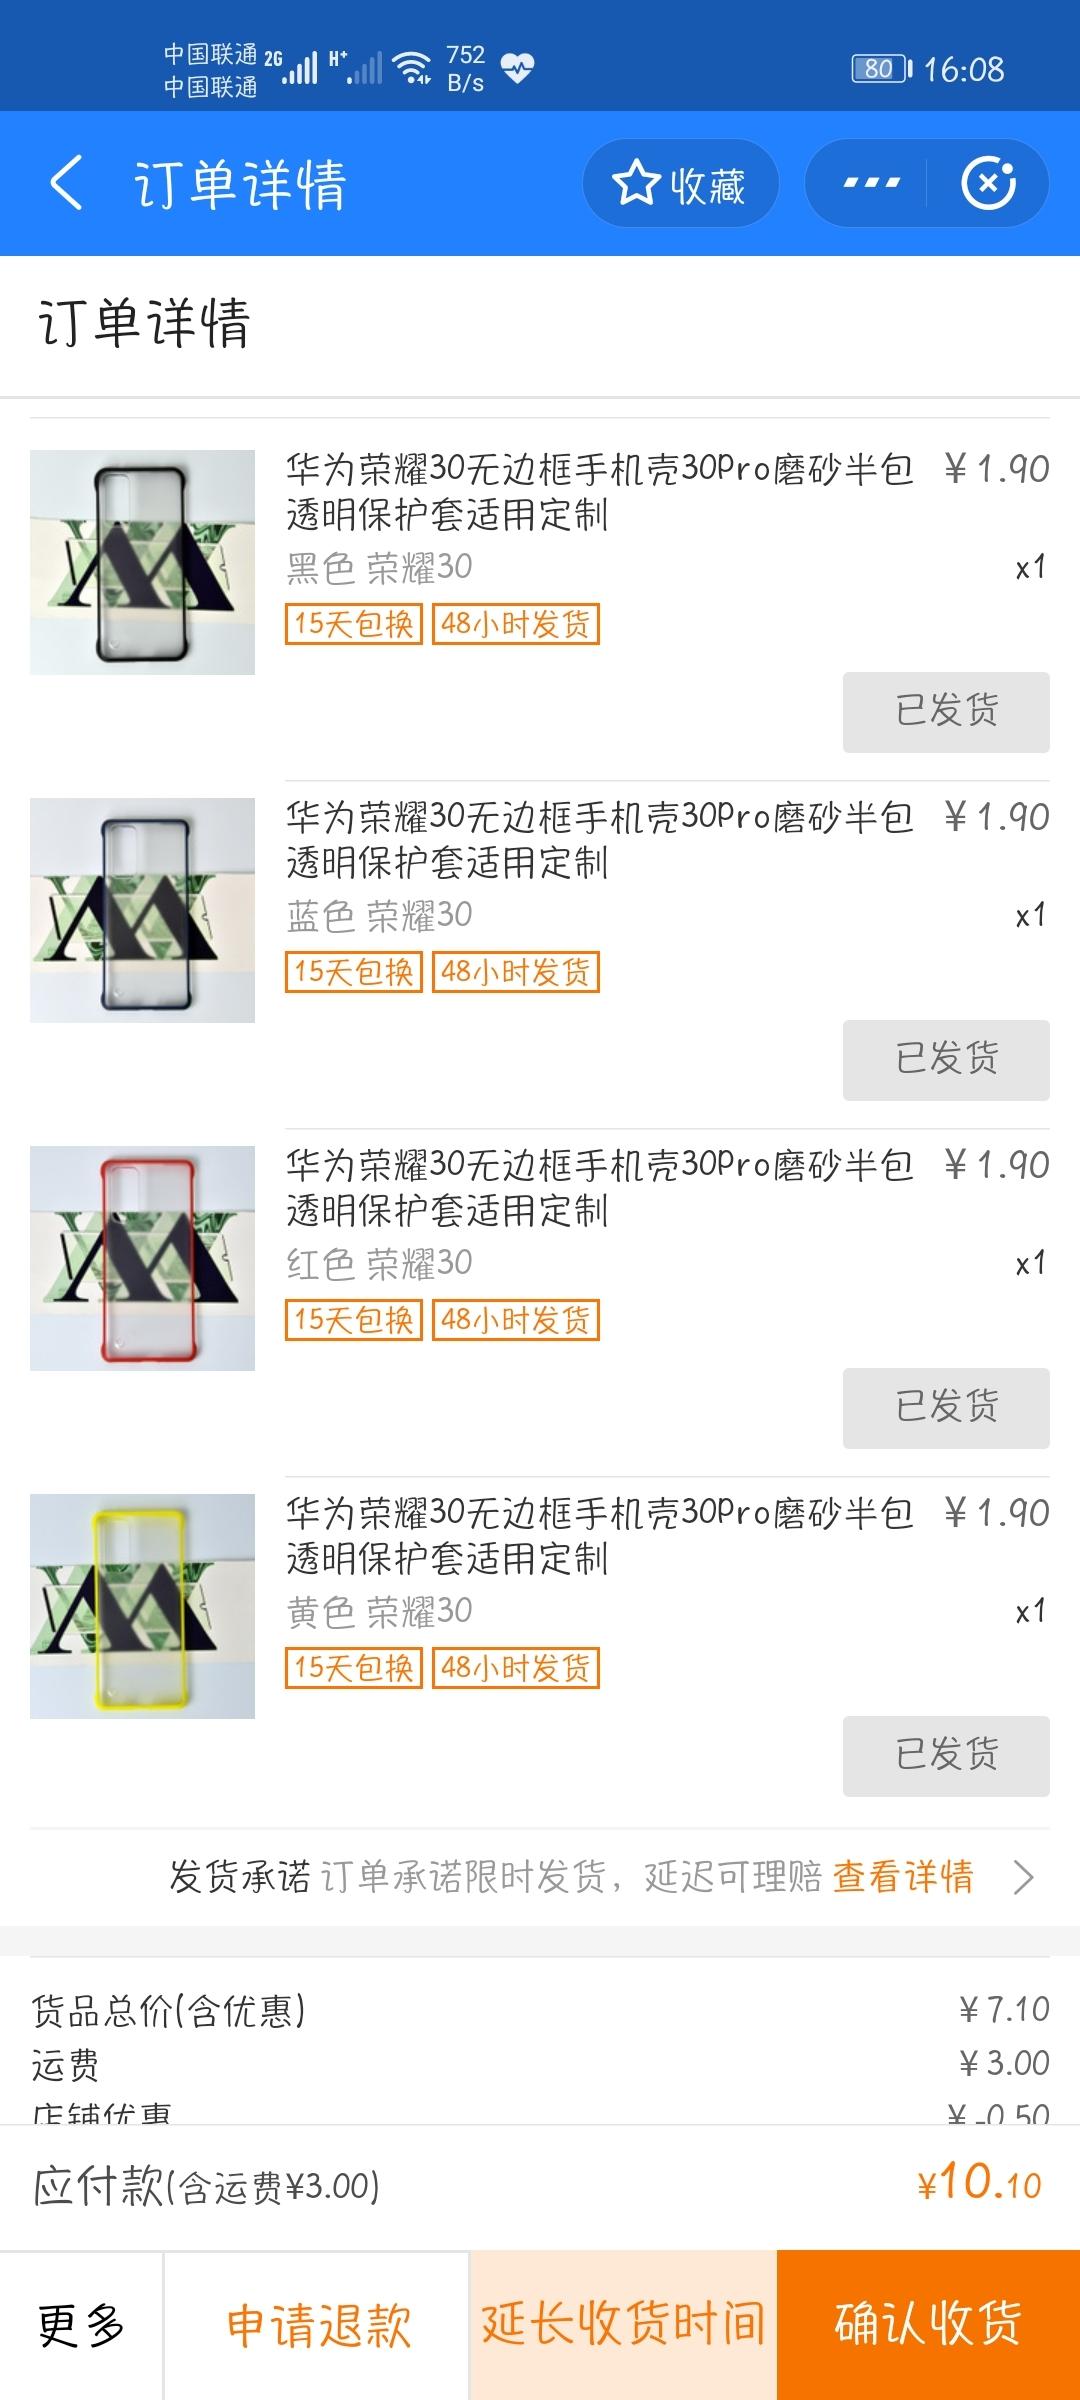 Screenshot_20200516_160830_com.eg.android.AlipayGphone.jpg